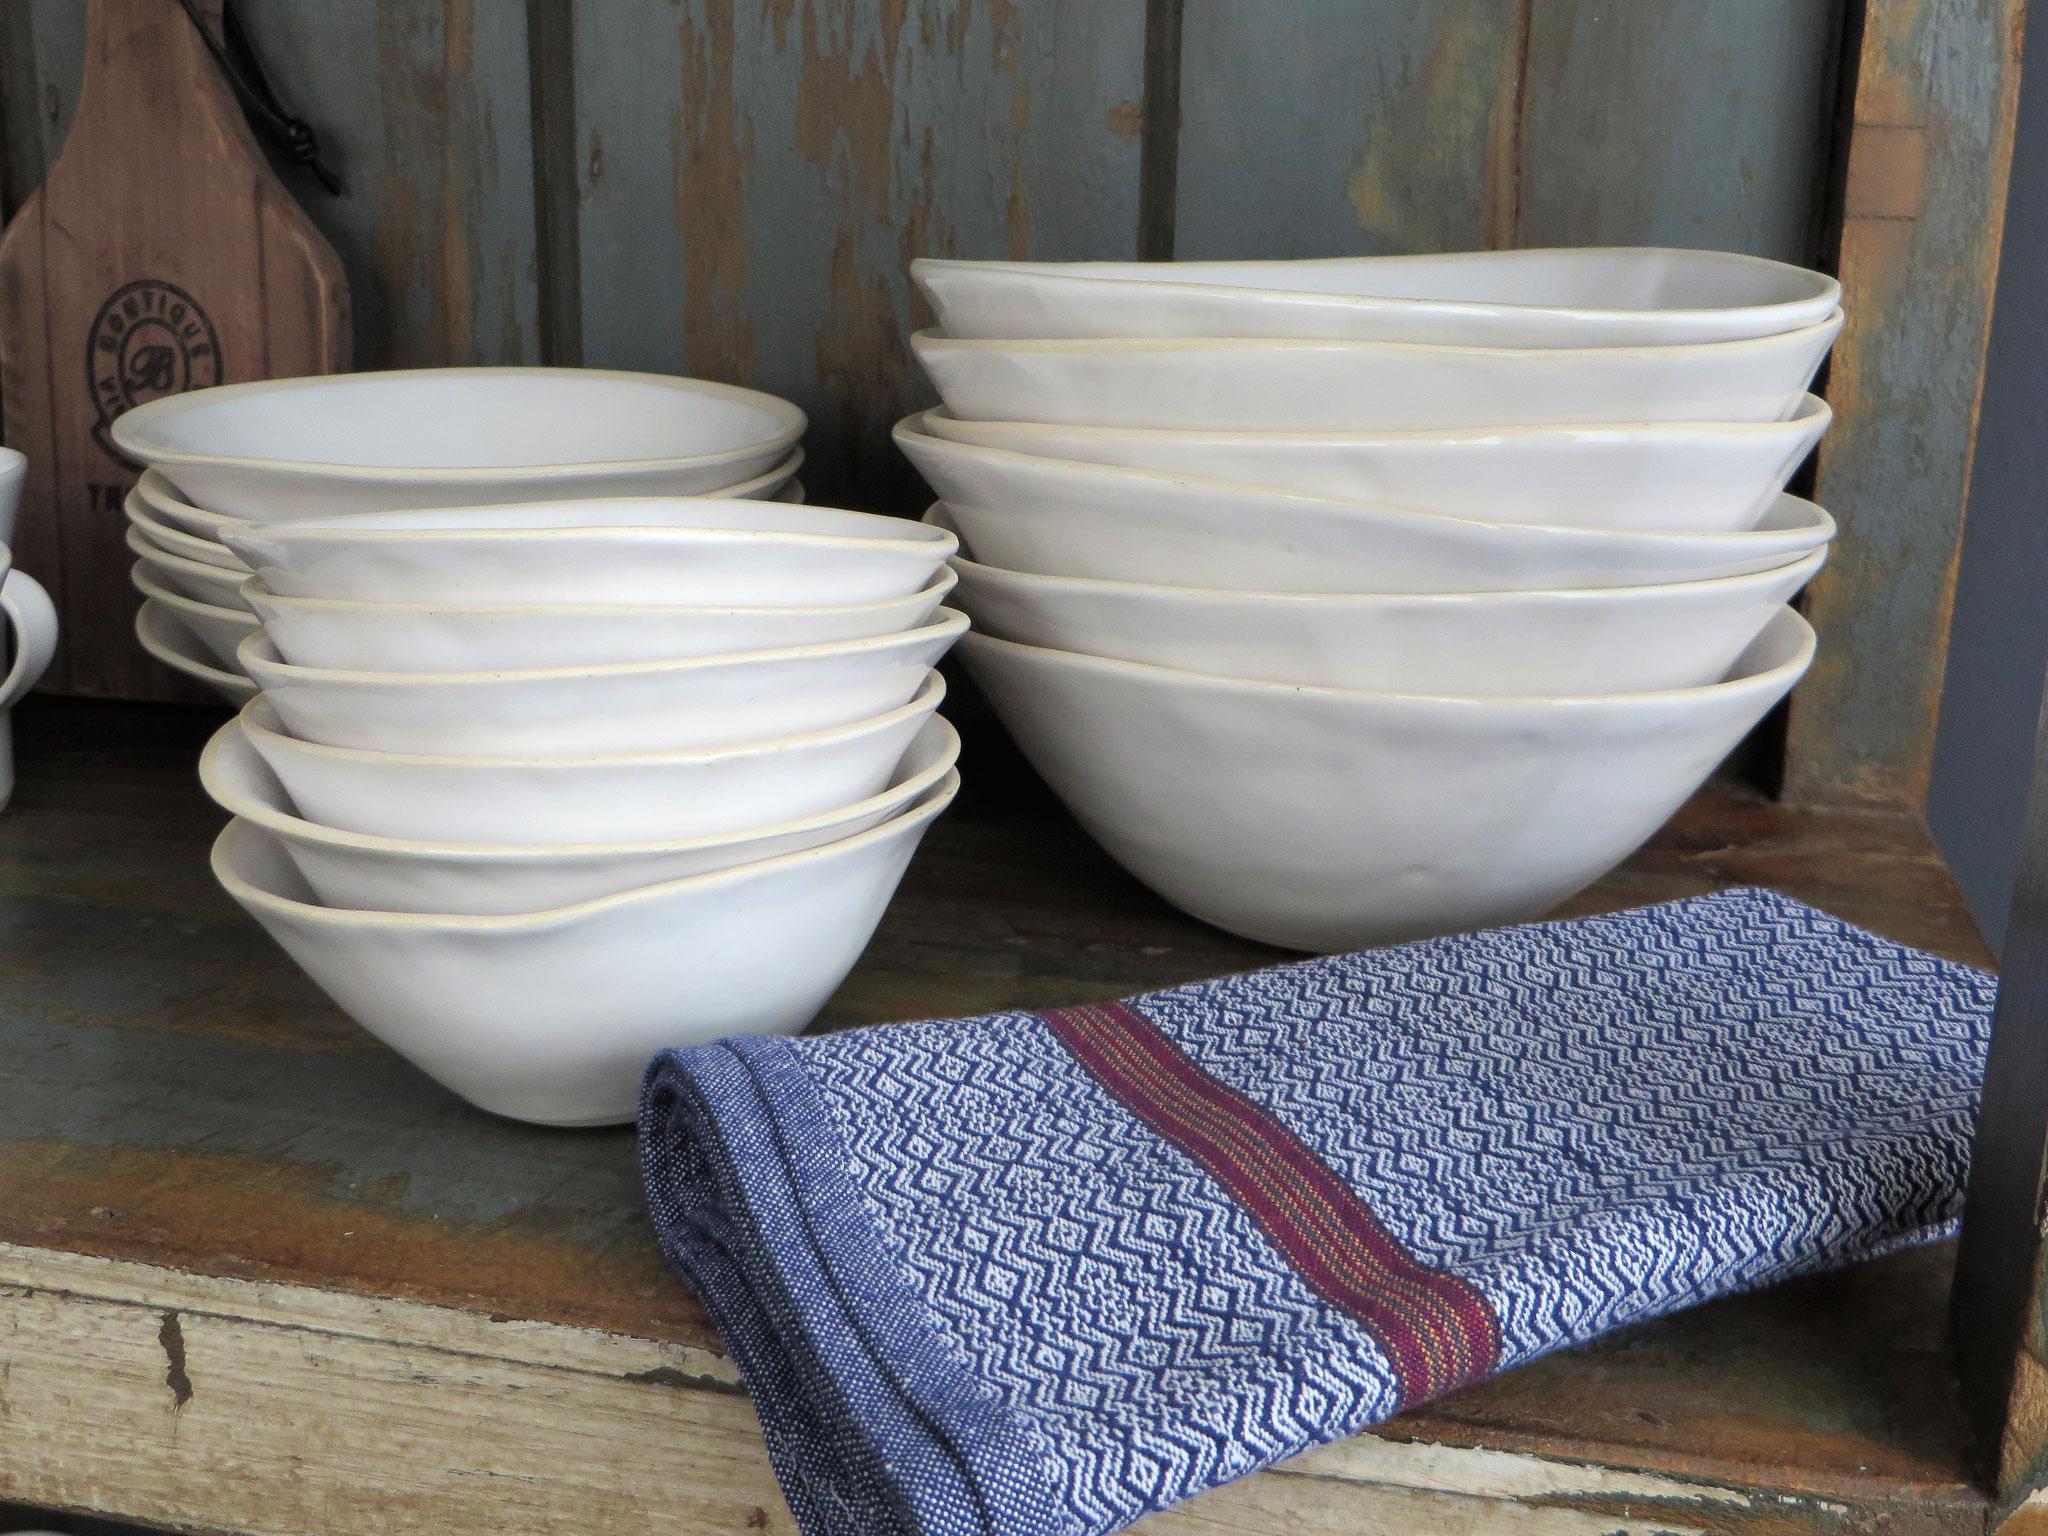 Wonki Ware Keramik mit Mungo Boma Serviette